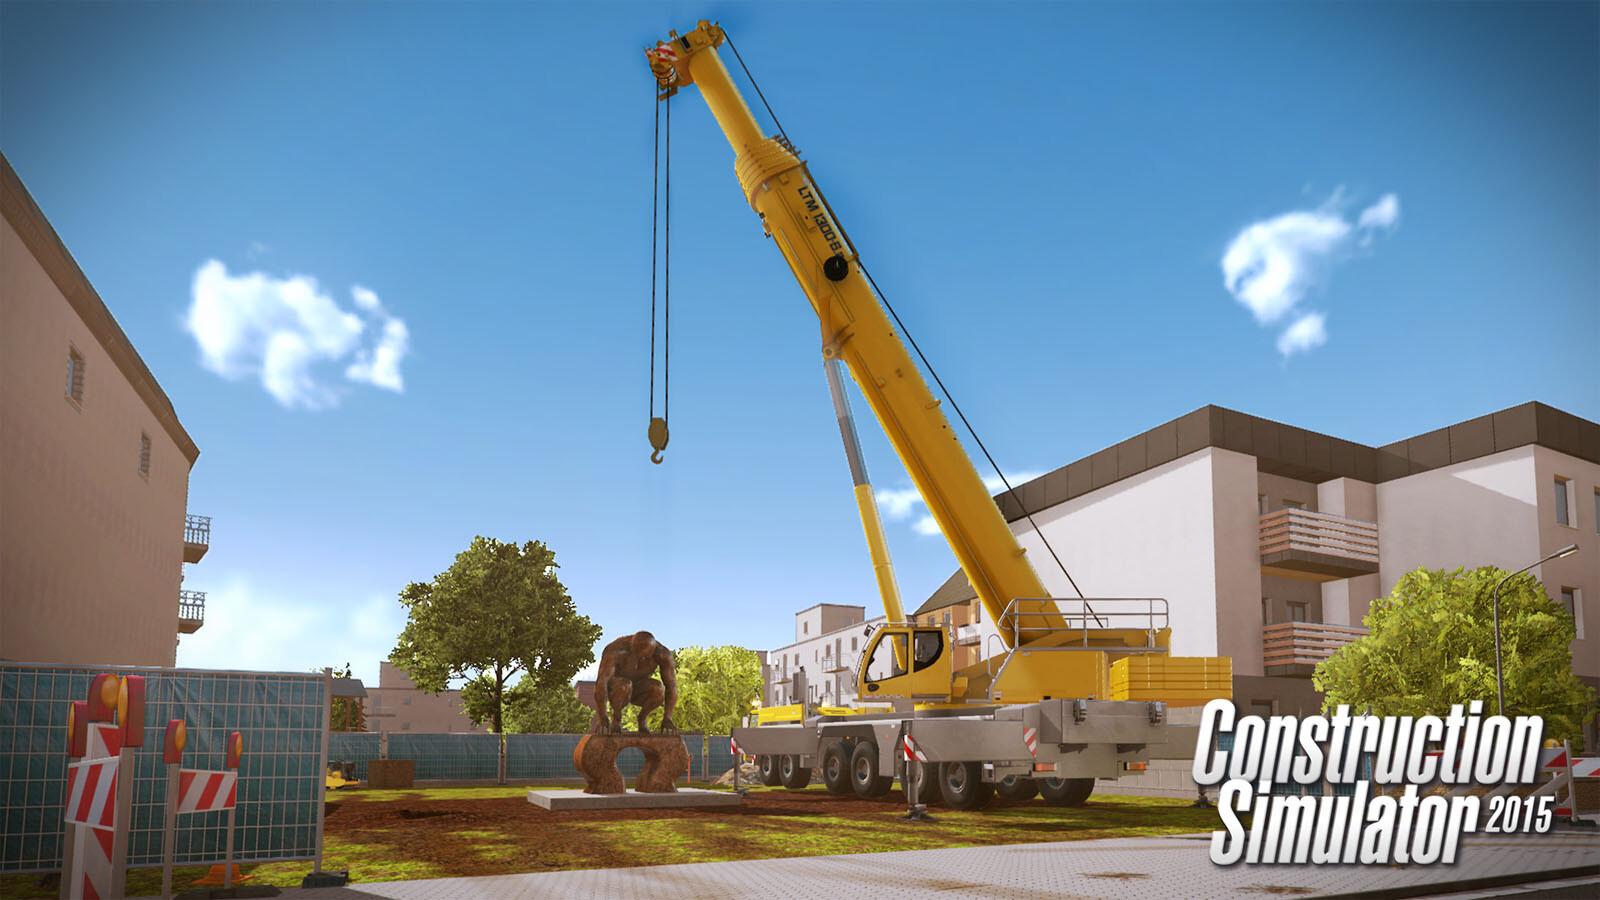 Construction Simulator 2015: Liebherr LTM 1300 6 2 DLC 6 [Steam CD Key] for  PC, Mac and Linux - Buy now